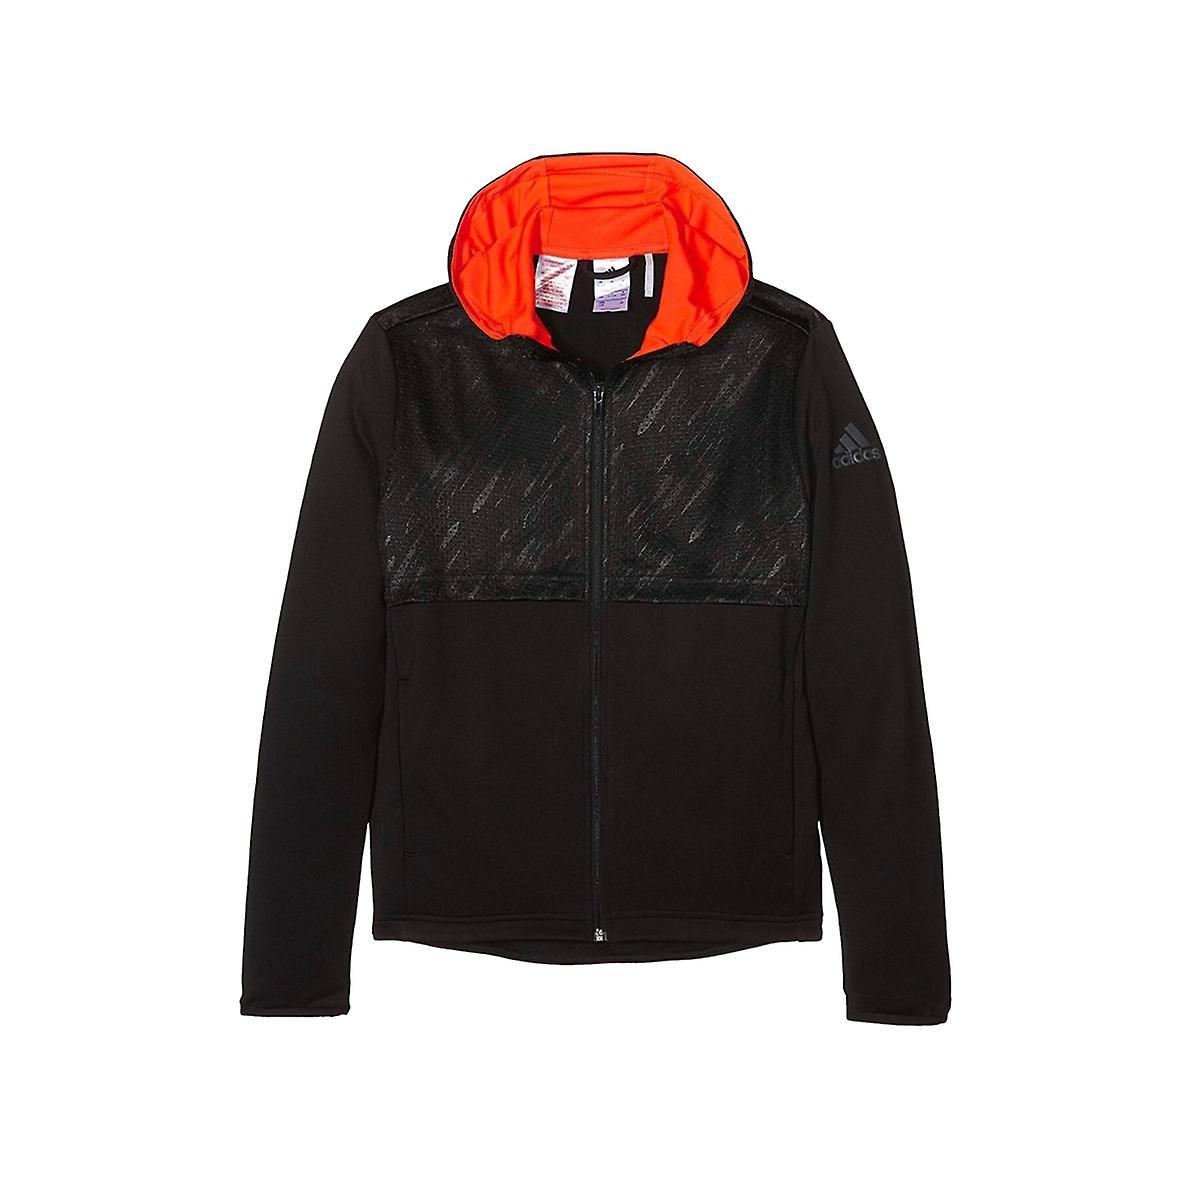 Adidas Boys Hooded Jacket